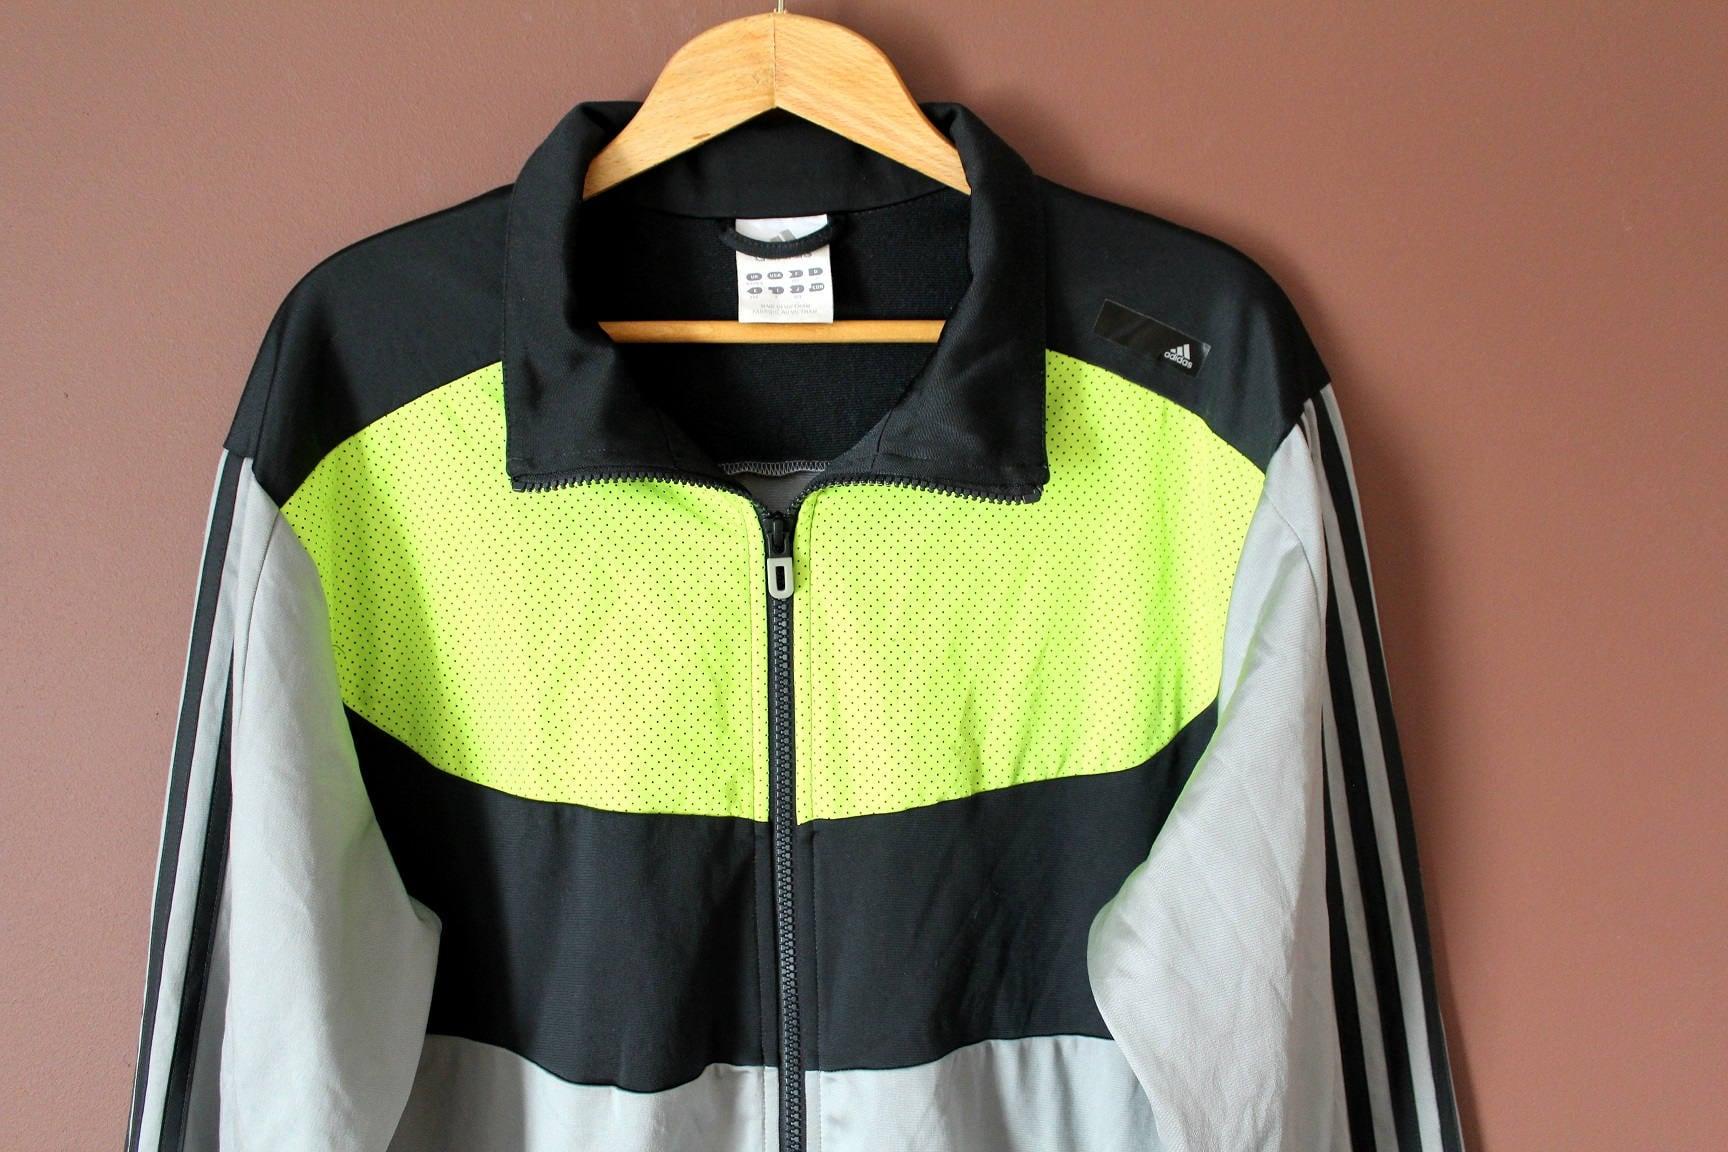 d82db7cb51493 90's ADIDAS Jacket, Vintage Adidas Windbreaker, Retro Hip Hop Grunge  Trainer Sport Jacket, Rare Large Size Shiny Gray Adidas Tracksuit